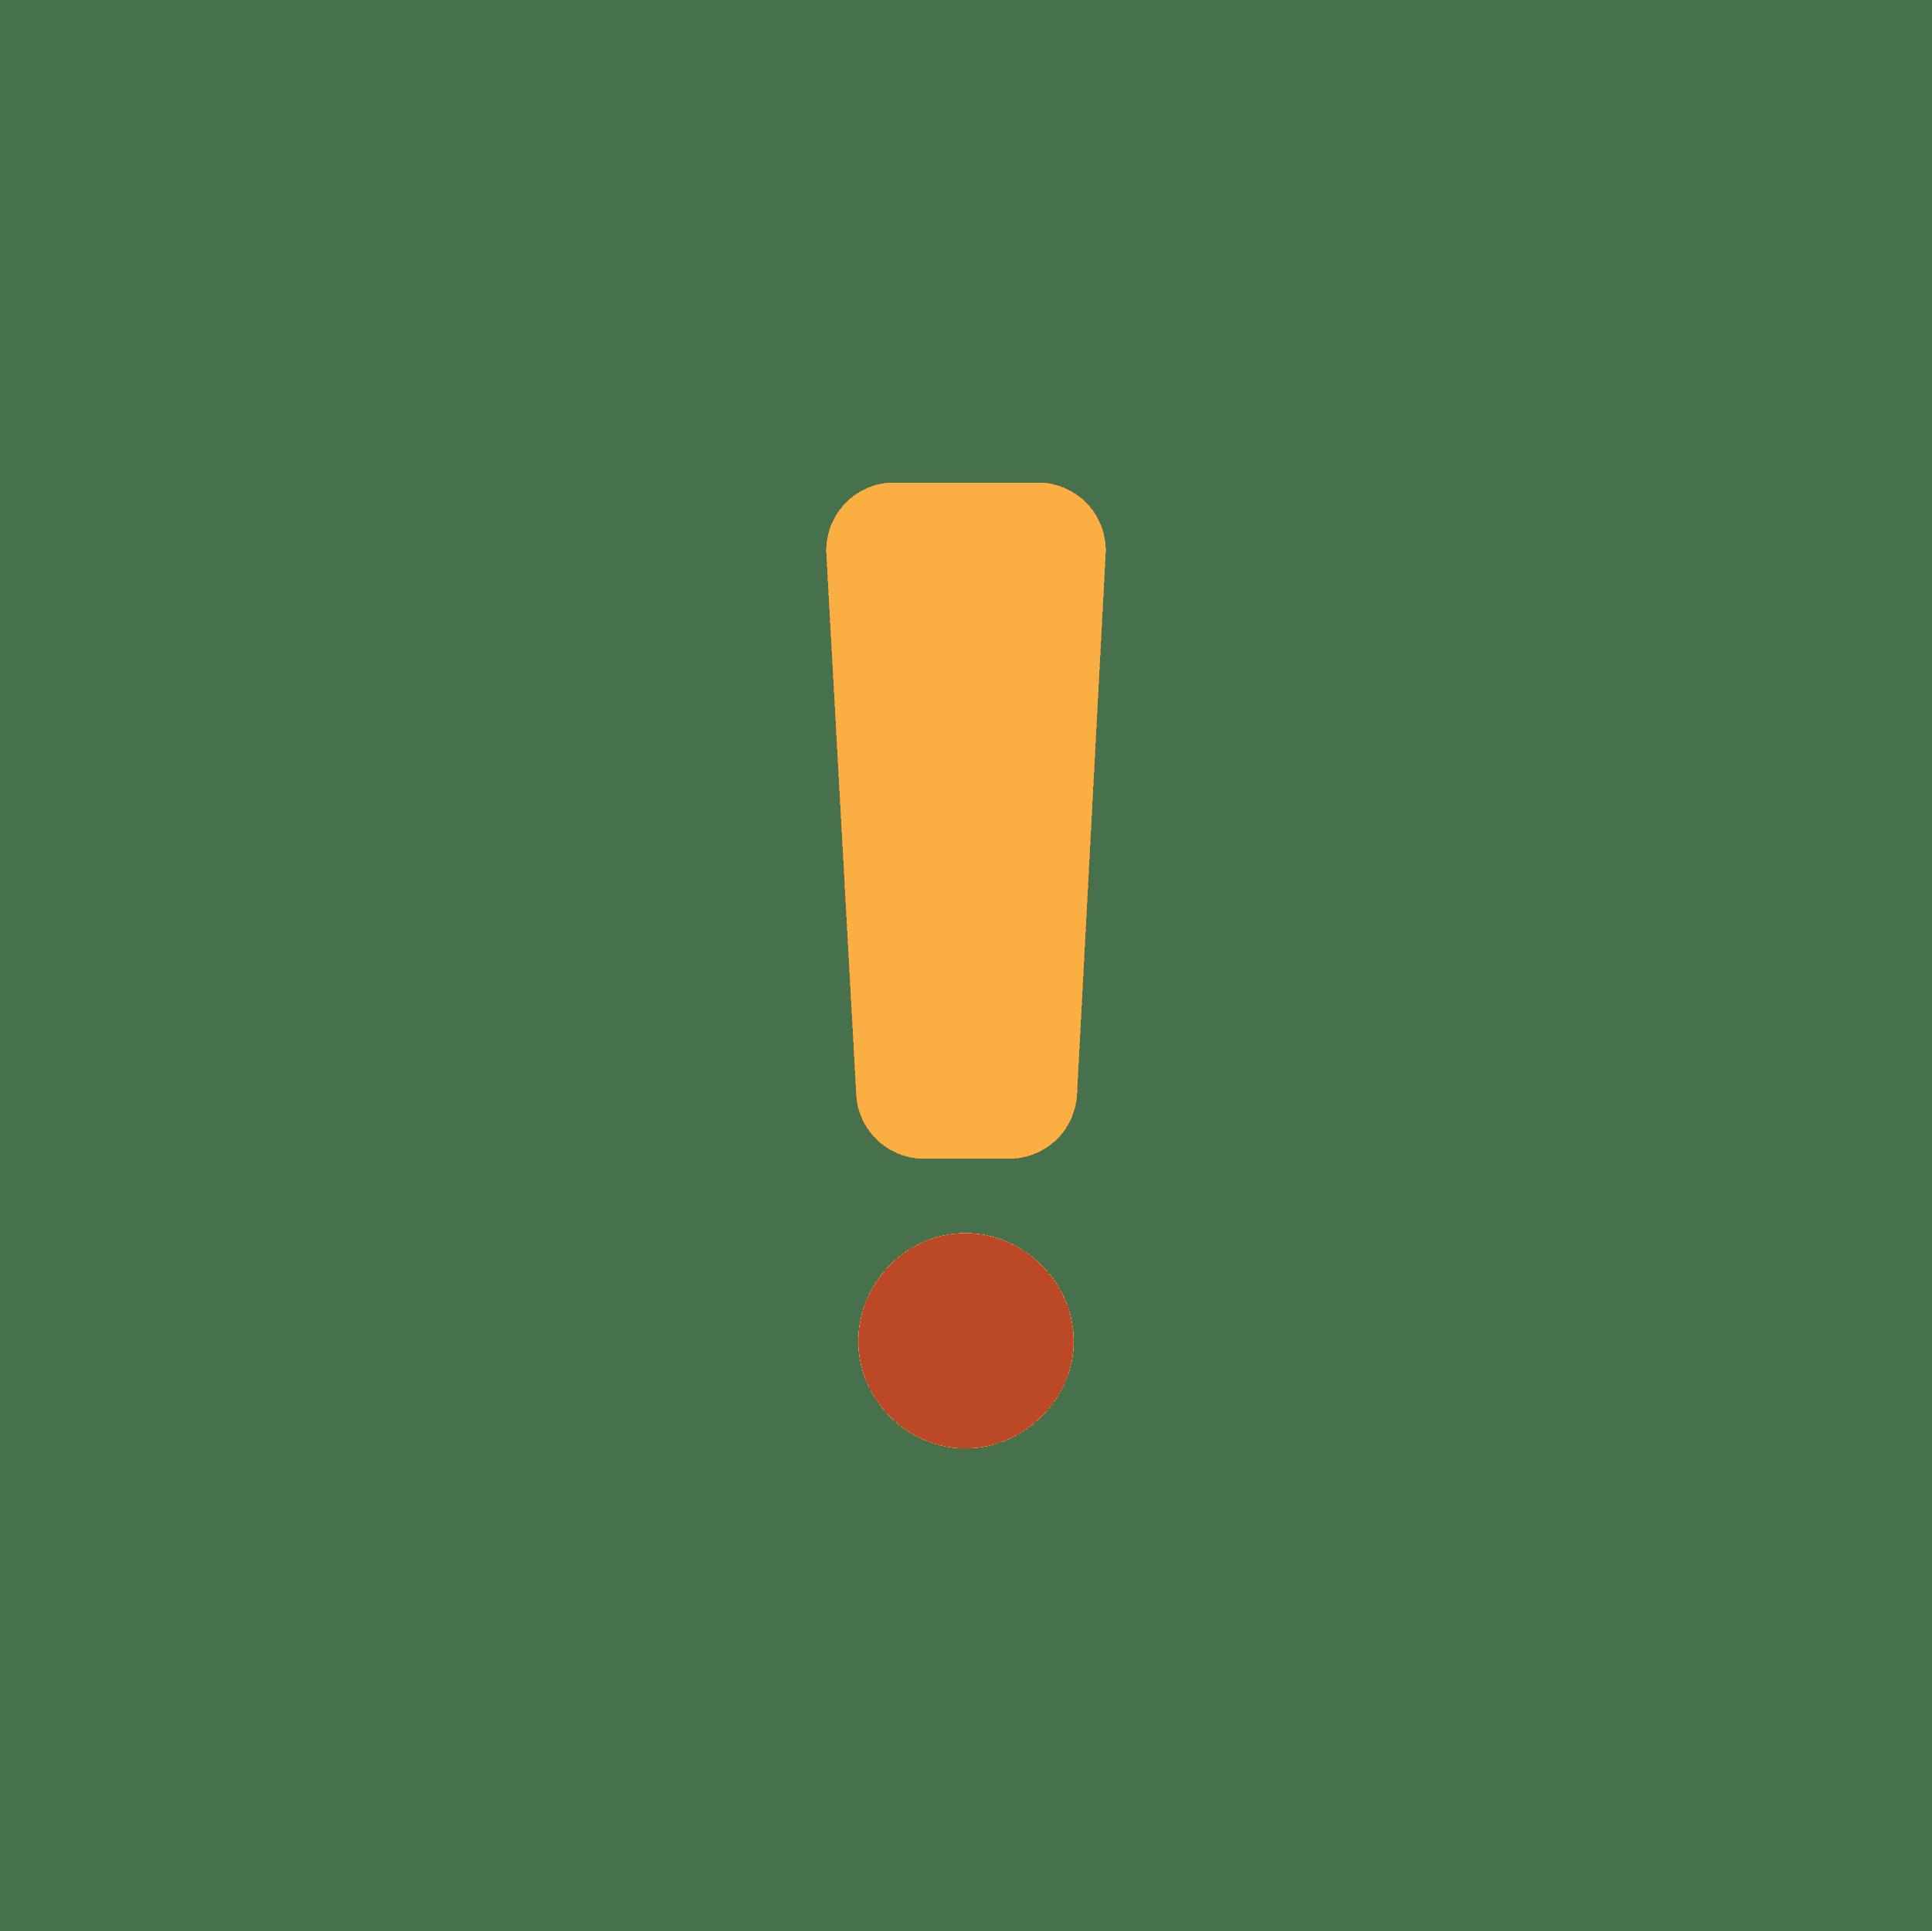 Hamburger graphic